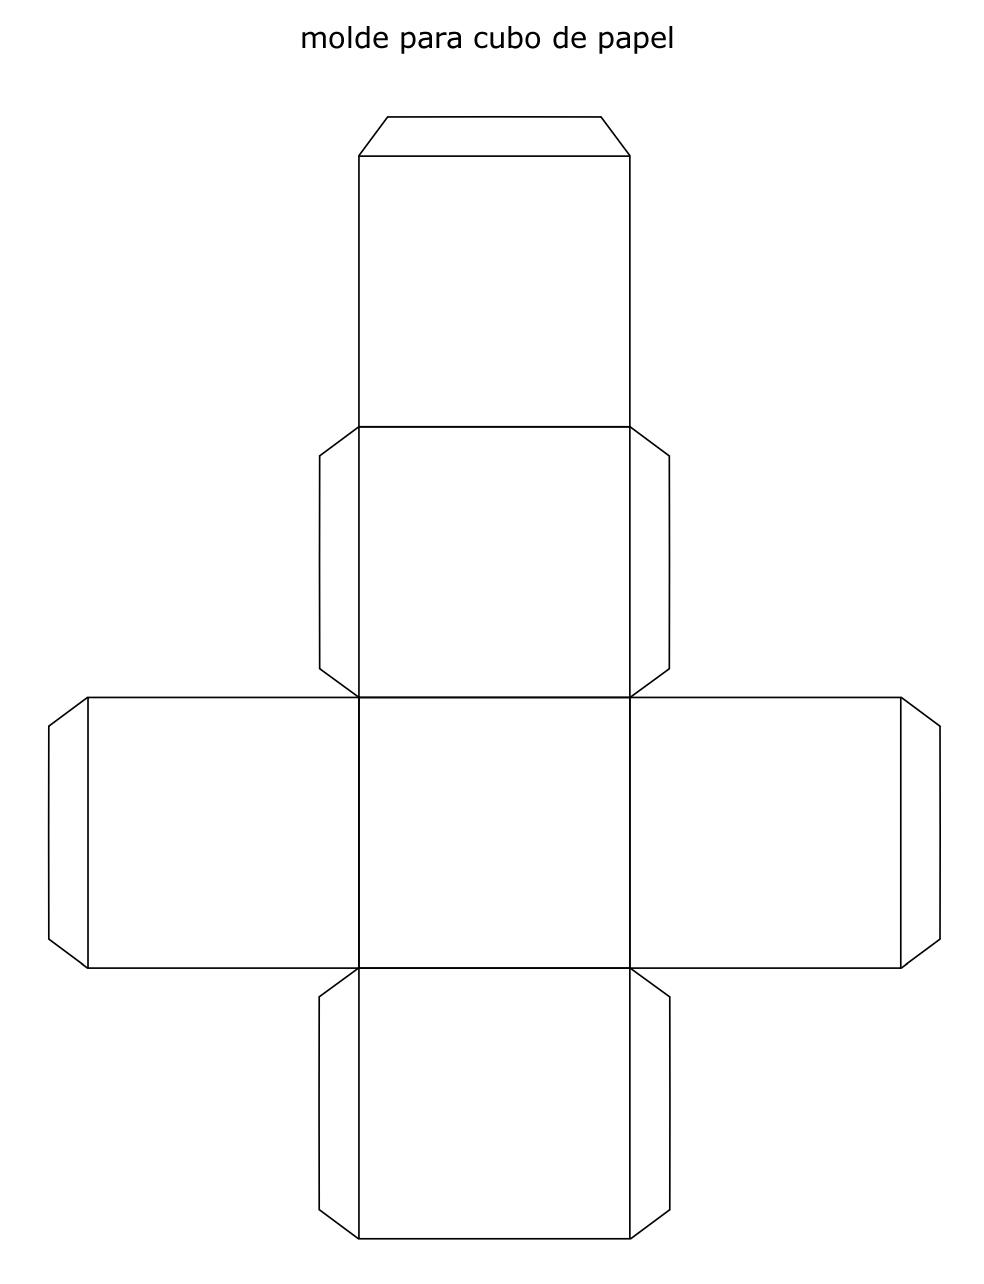 Molde para cubo de papel